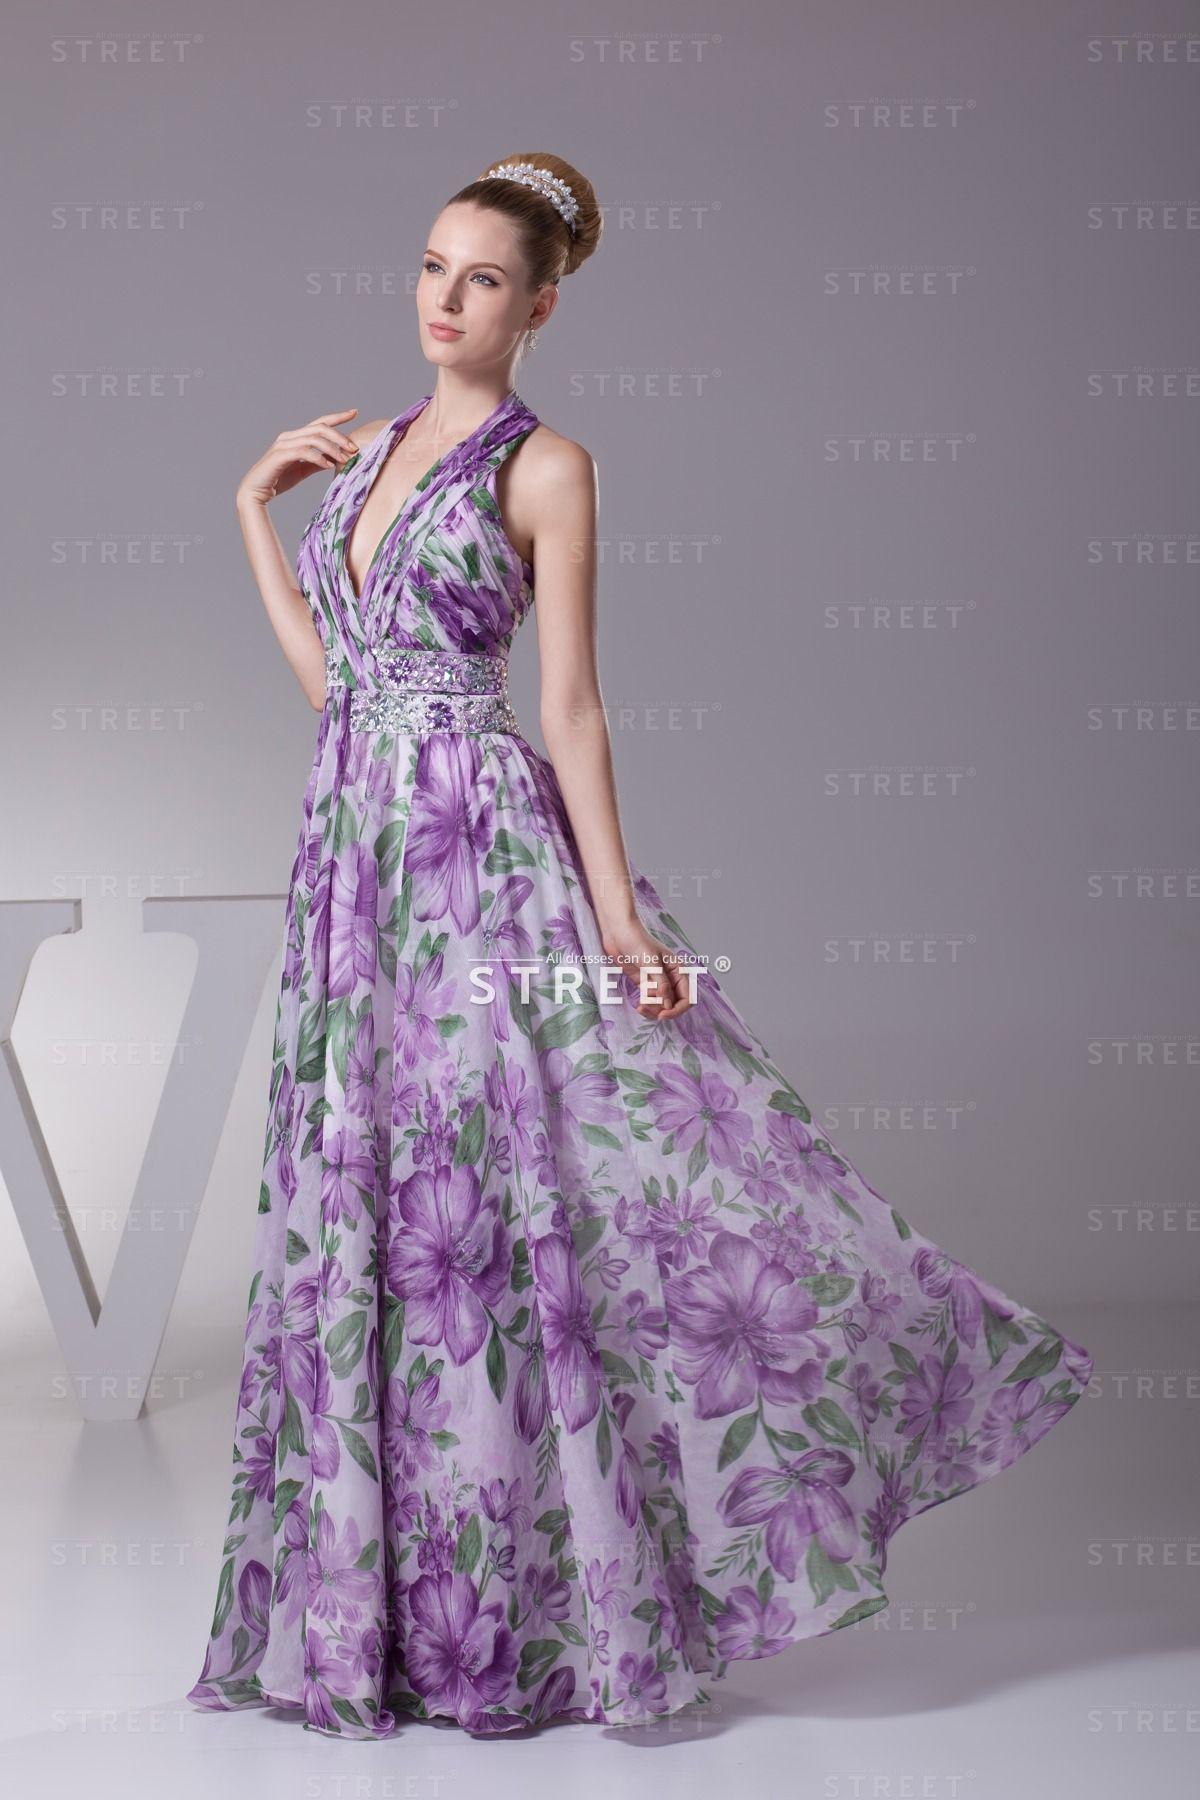 Flattering Awesone Purple Floor Length Floral Jewered Helter Chiffon Wedding Guest Dress Floorlen Plum Wedding Dresses Evening Dresses Prom Best Prom Dresses [ 1800 x 1200 Pixel ]